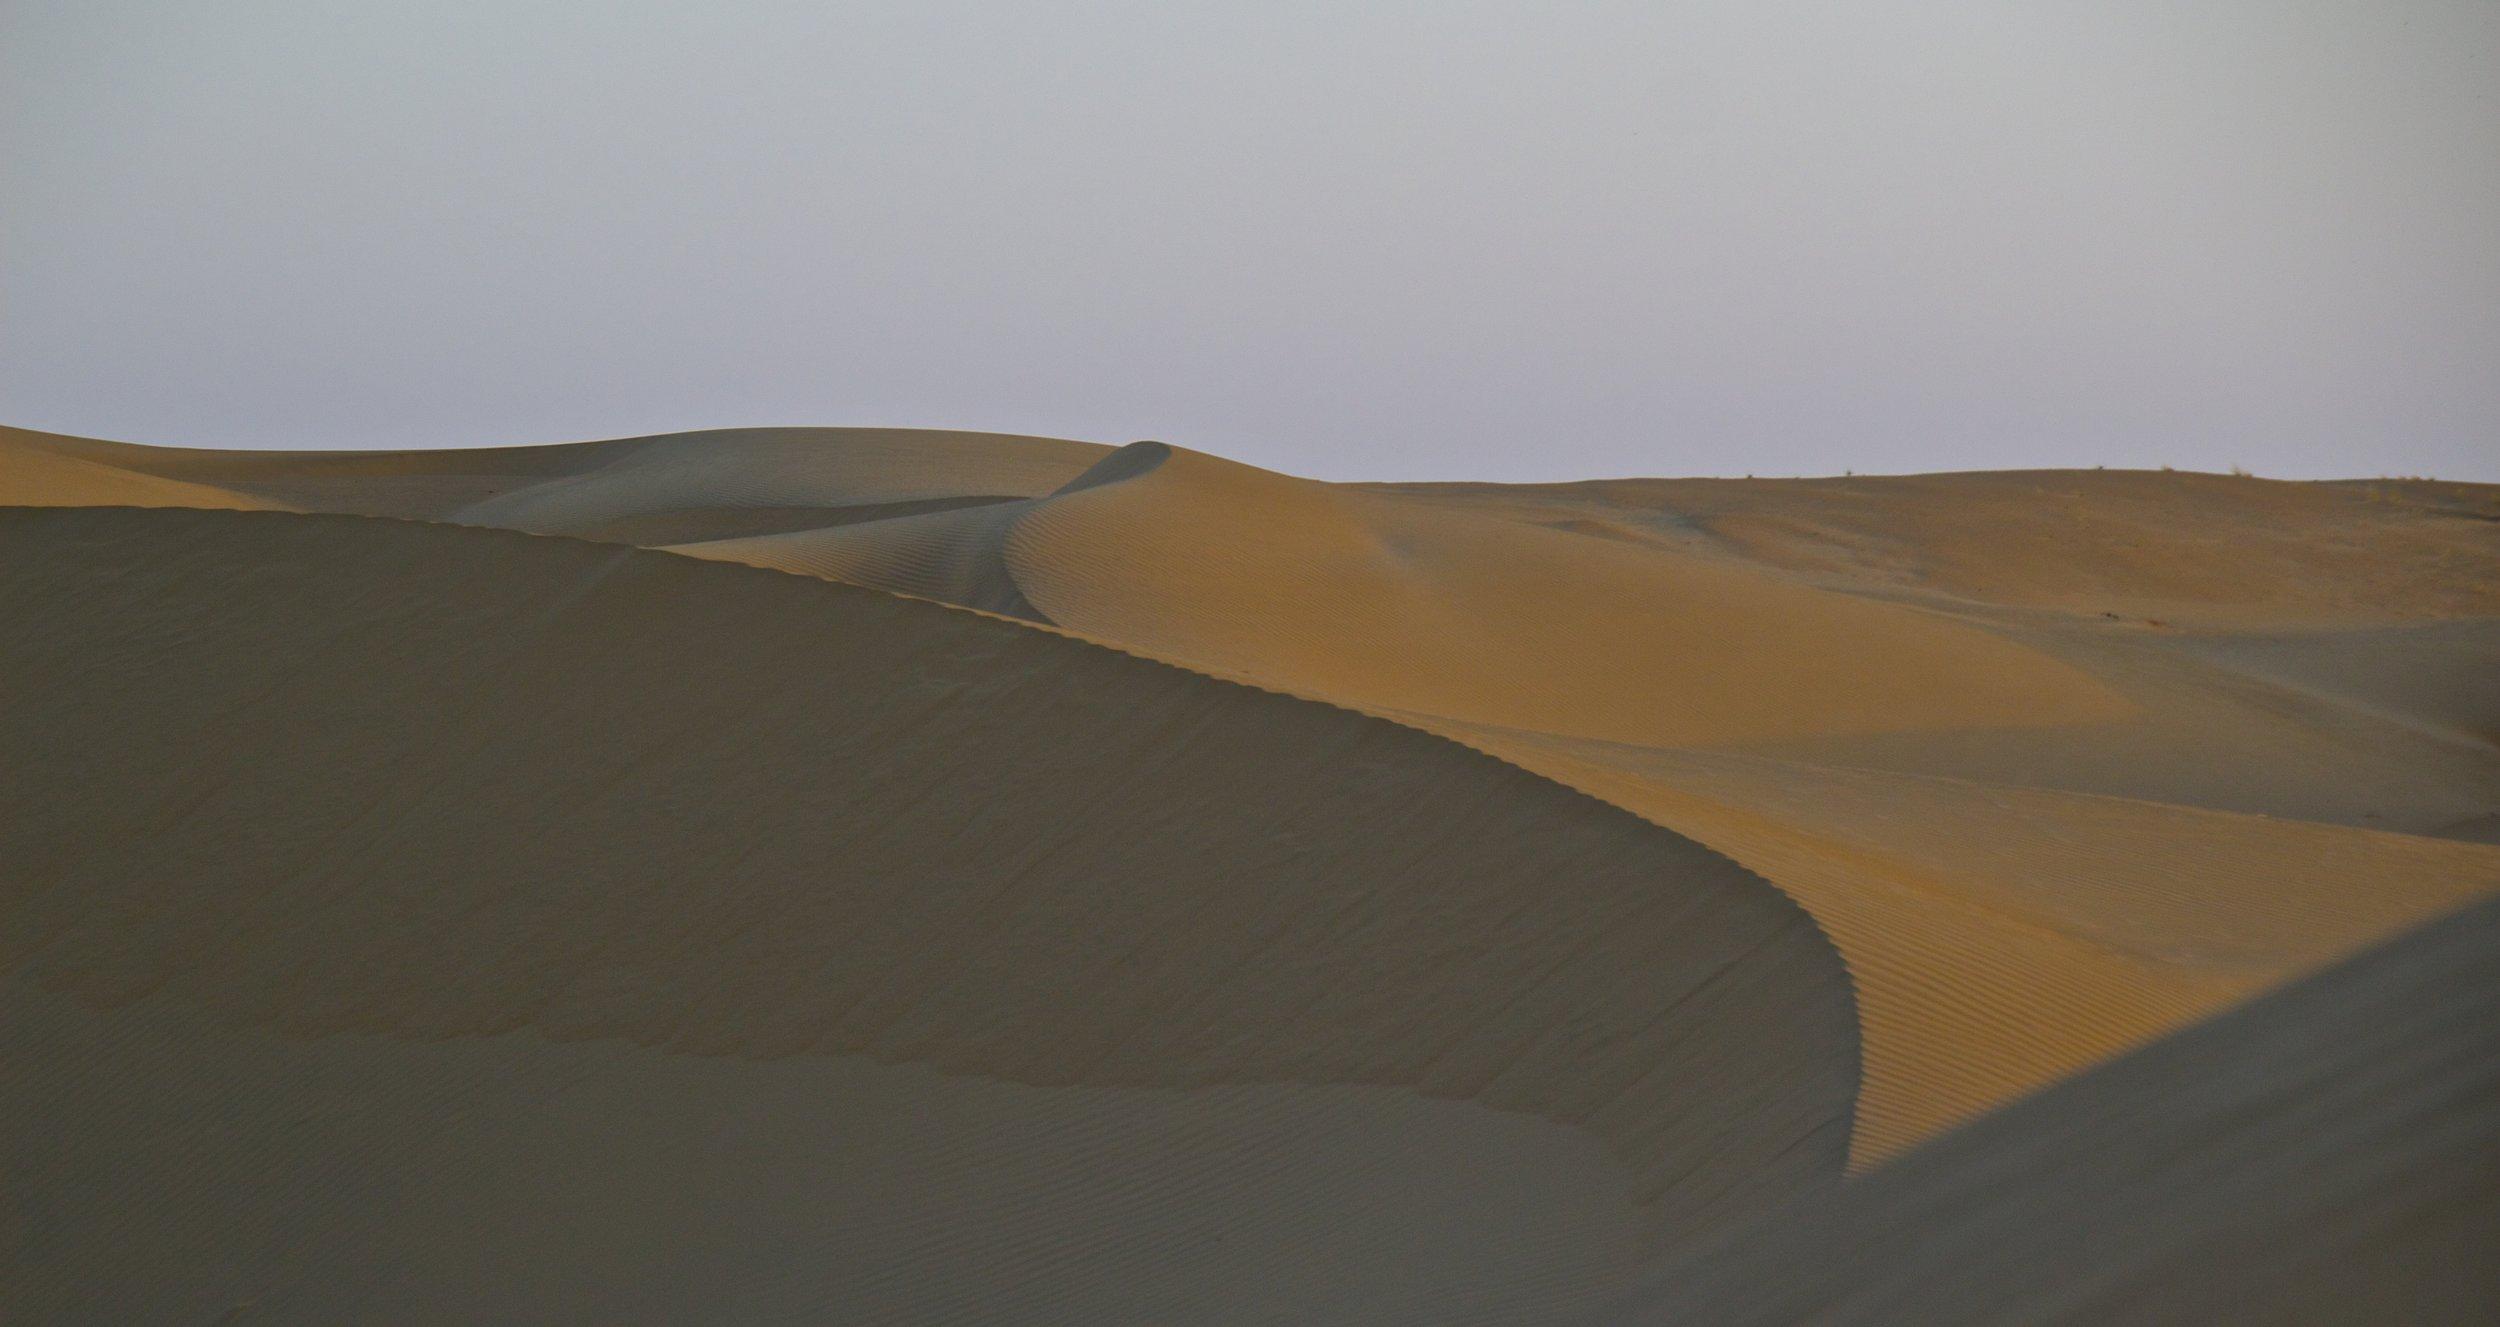 thar desert dunes rajasthan india photography camel safari 5.jpg